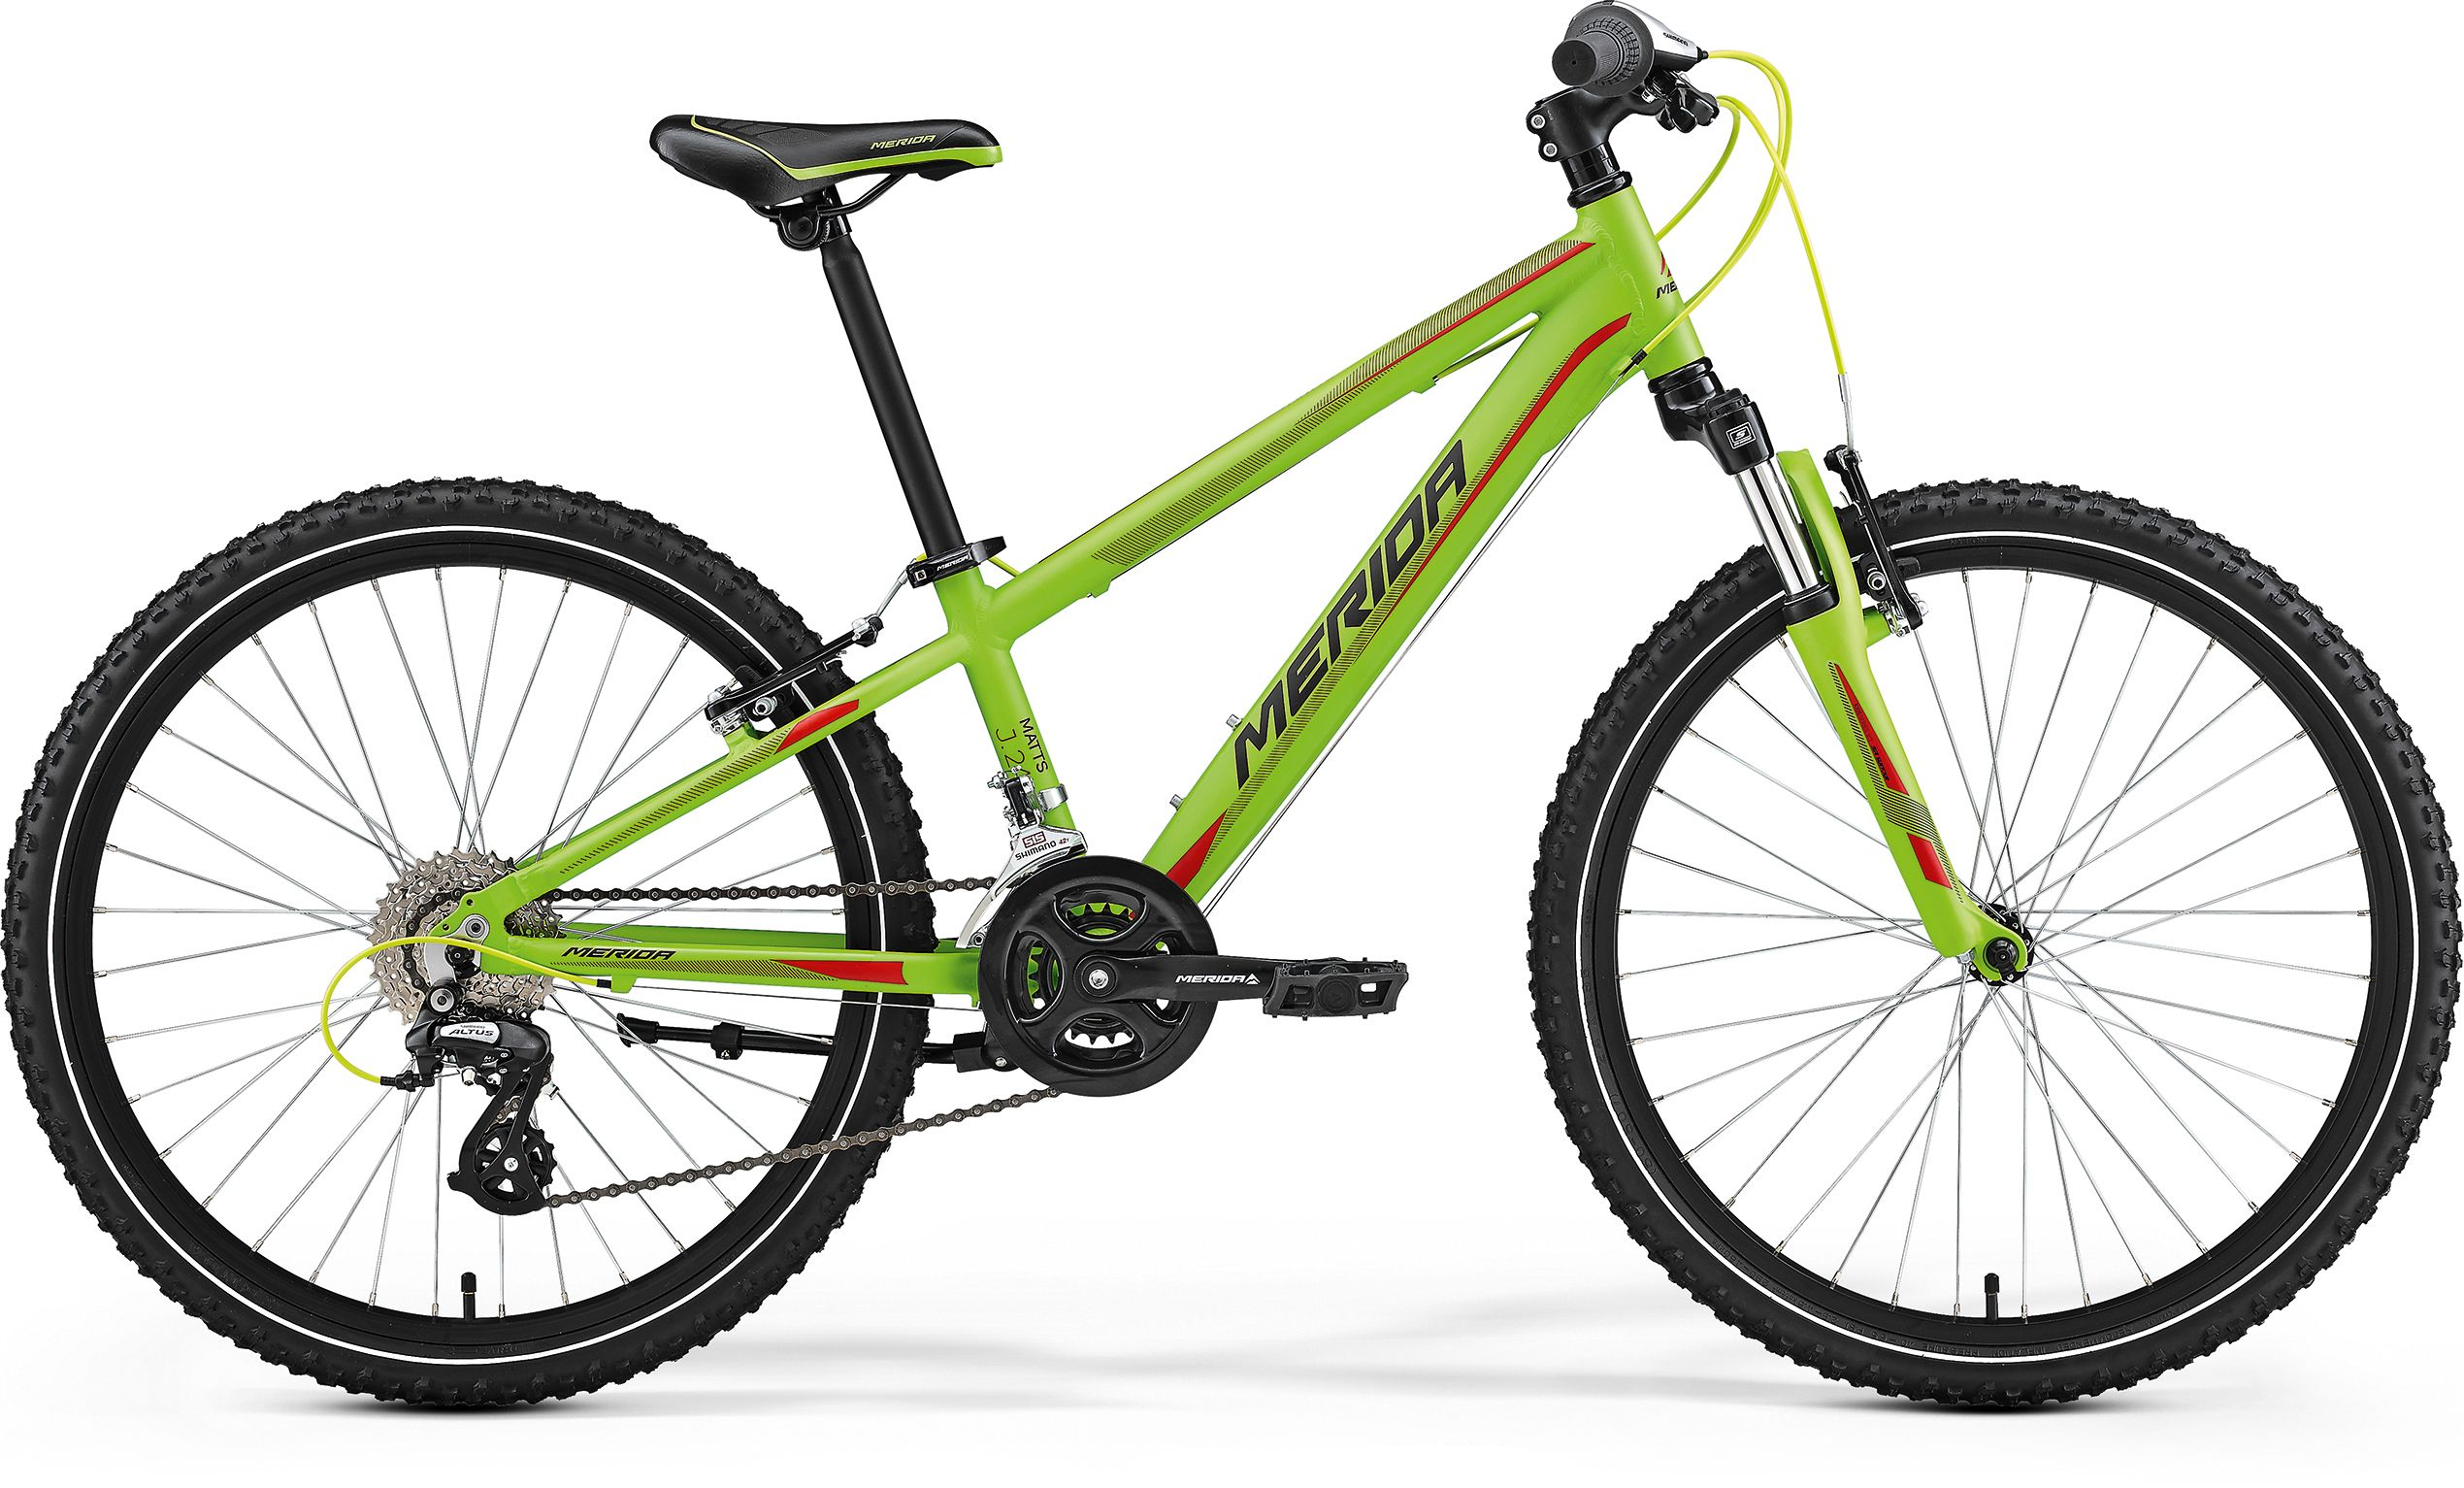 Велосипед Merida Matts J24 boy 2017 велосипед merida brad 4 2014